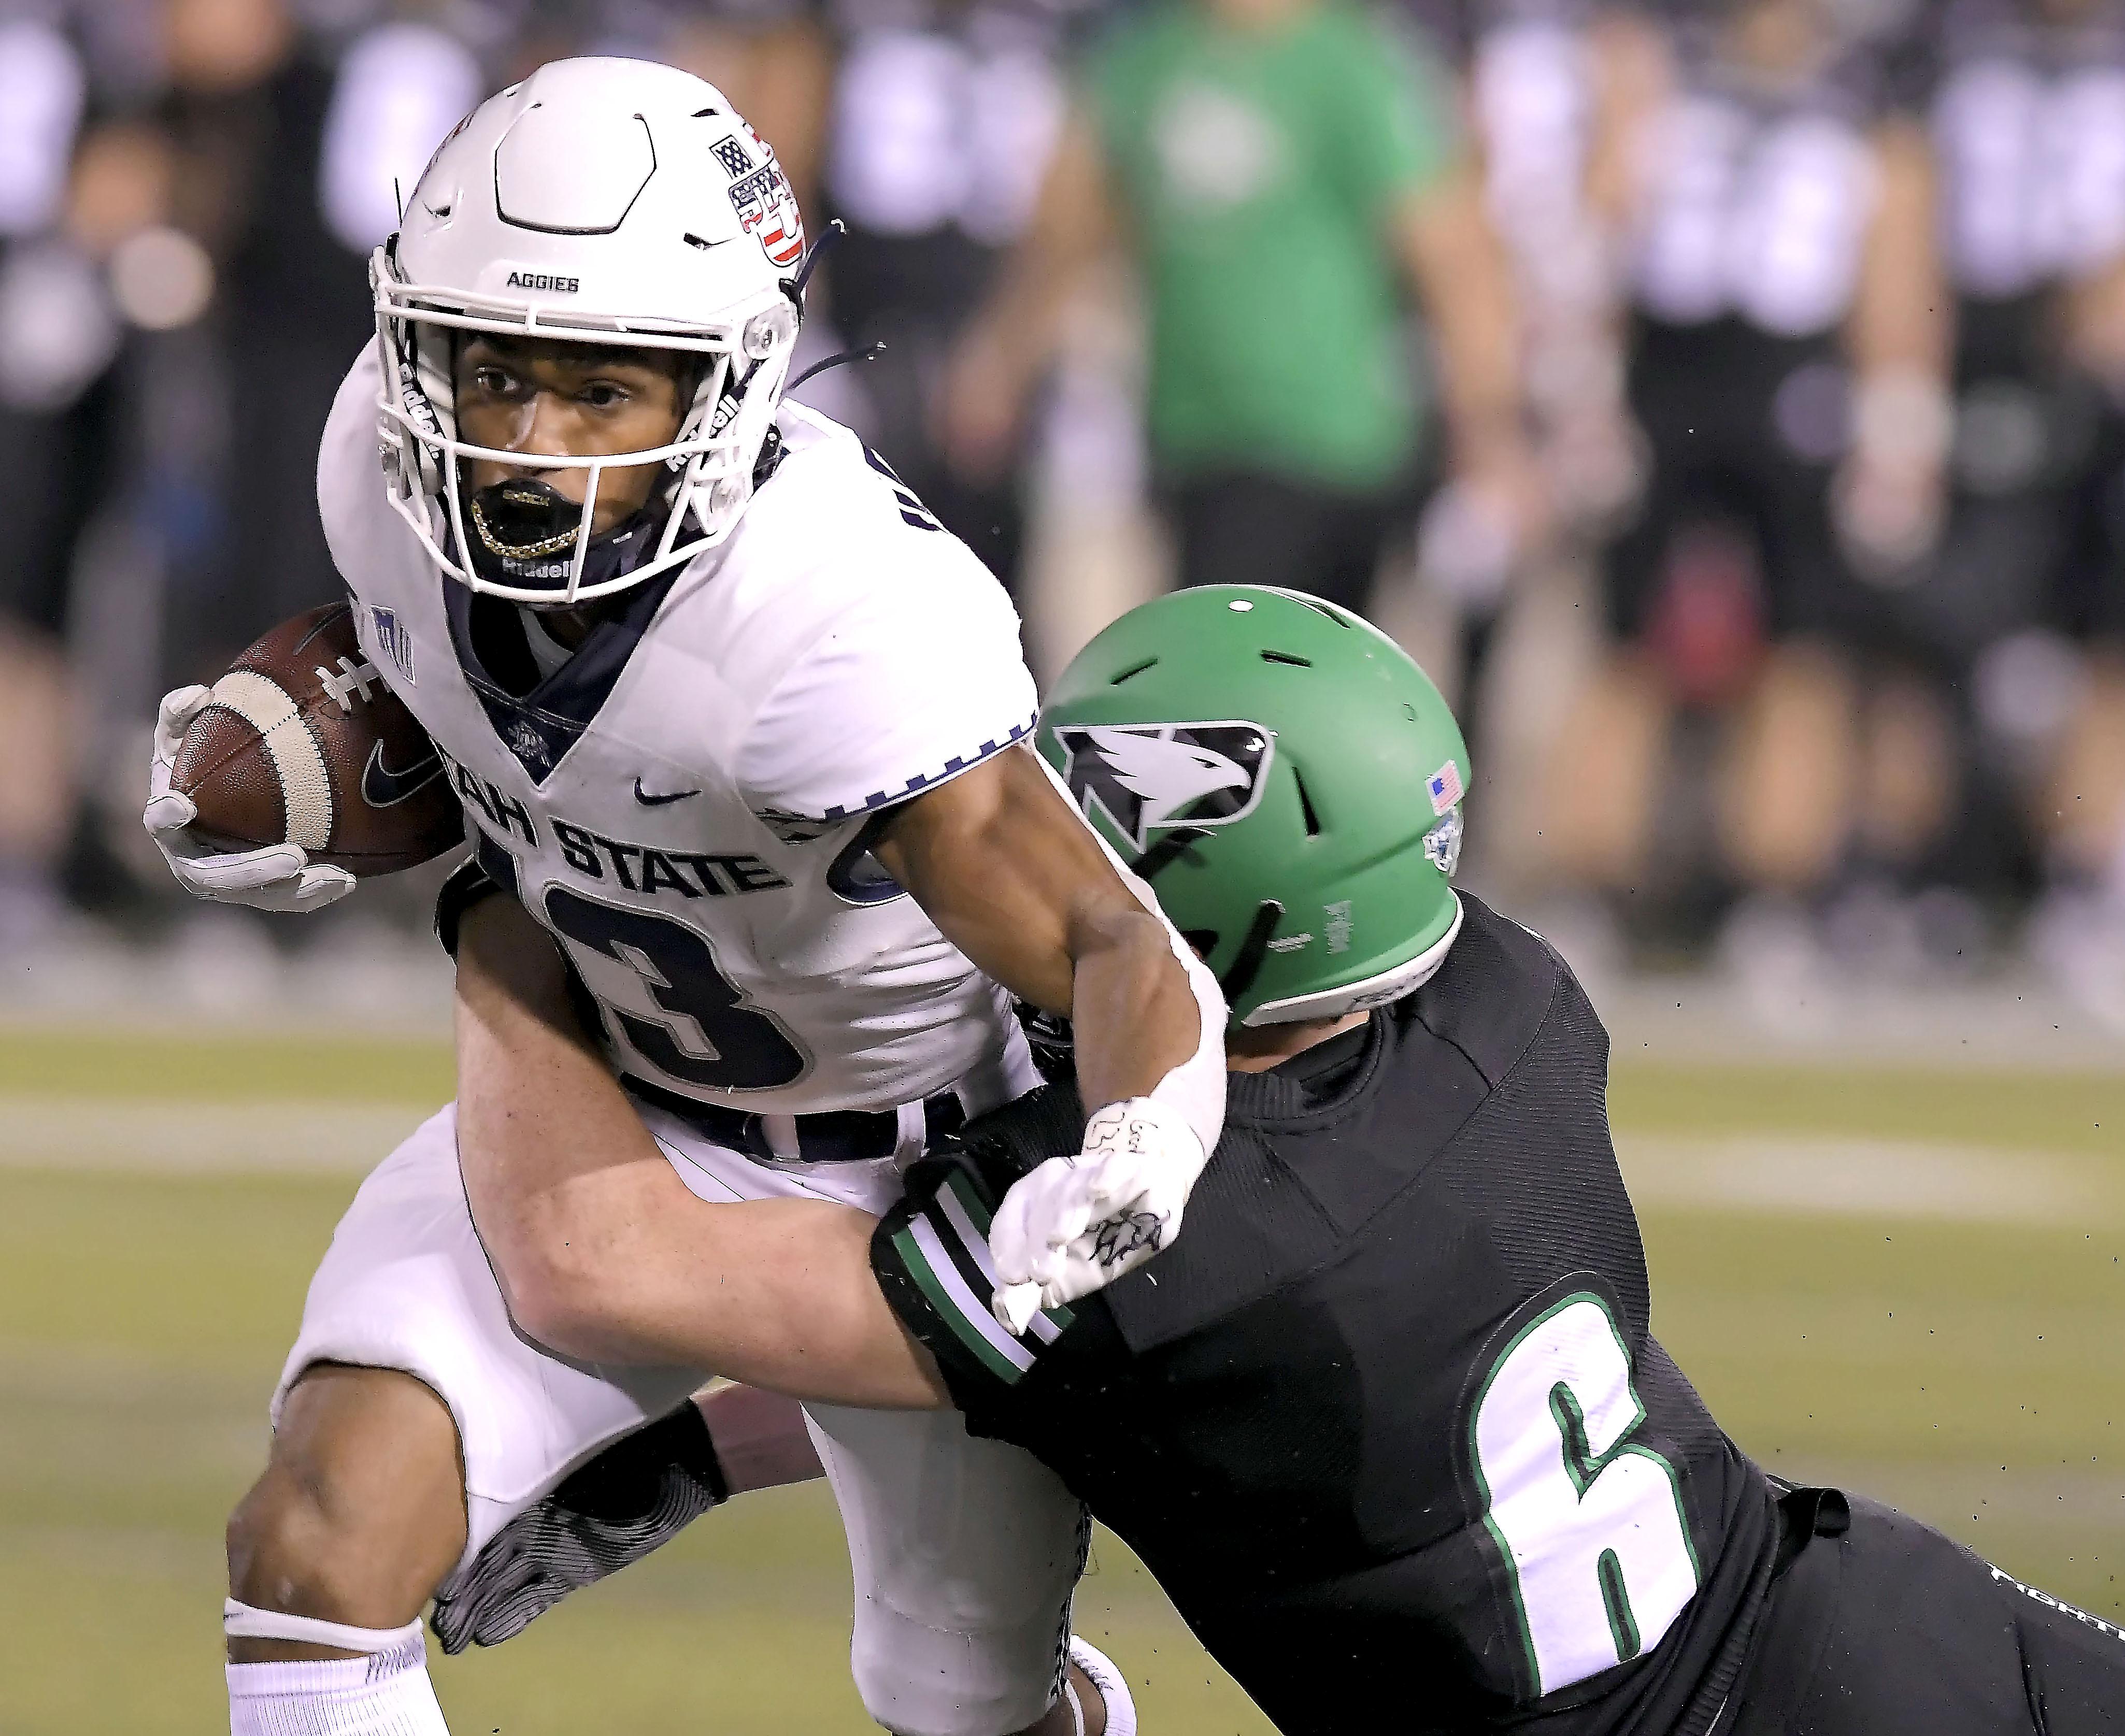 Utah State wide receiver Deven Thompkins is tackled by North Dakota defensive back Evan Holm.